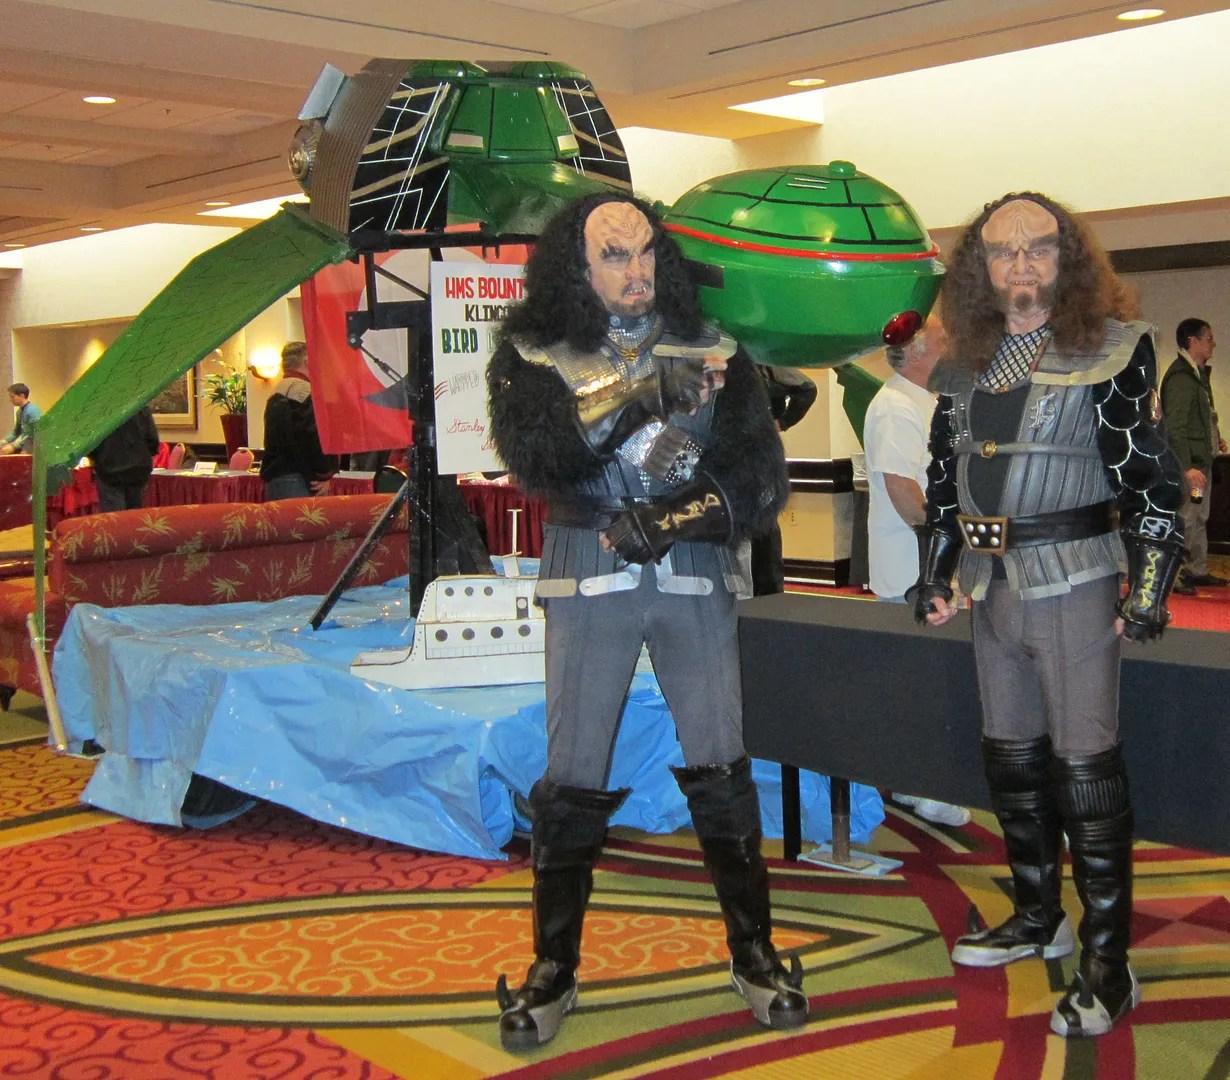 Gowron, Martok, Star Trek, Starbase Indy 2012